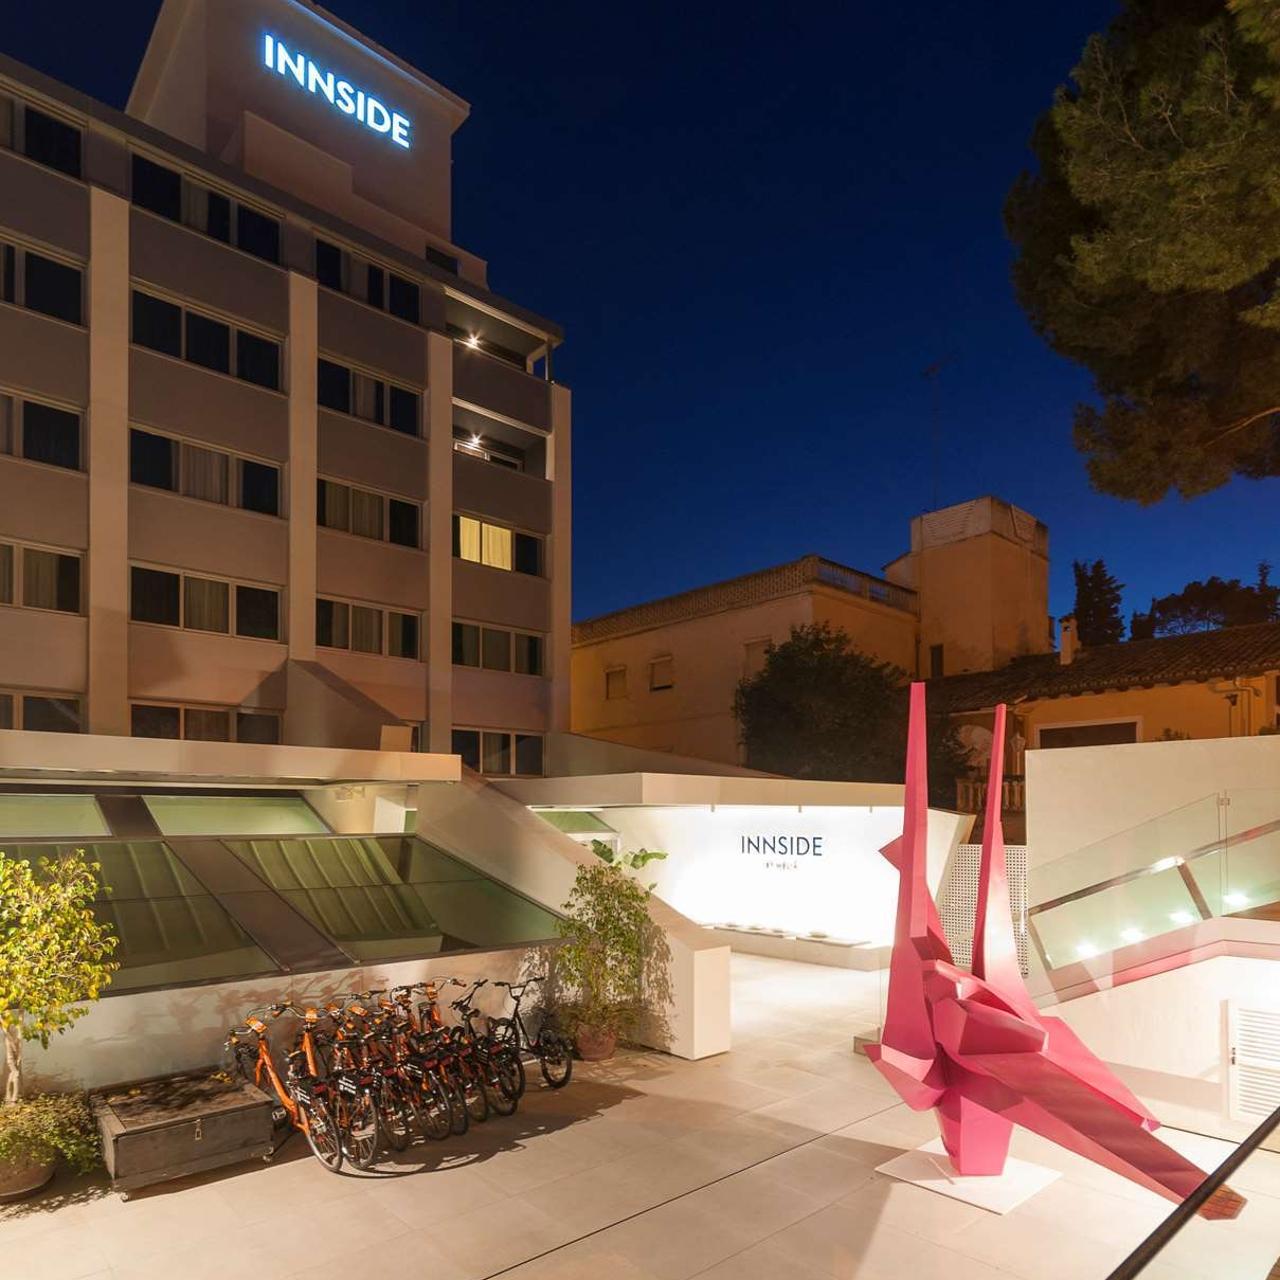 Innside Palma Bosque Palma De Mallorca At Hrs With Free Services